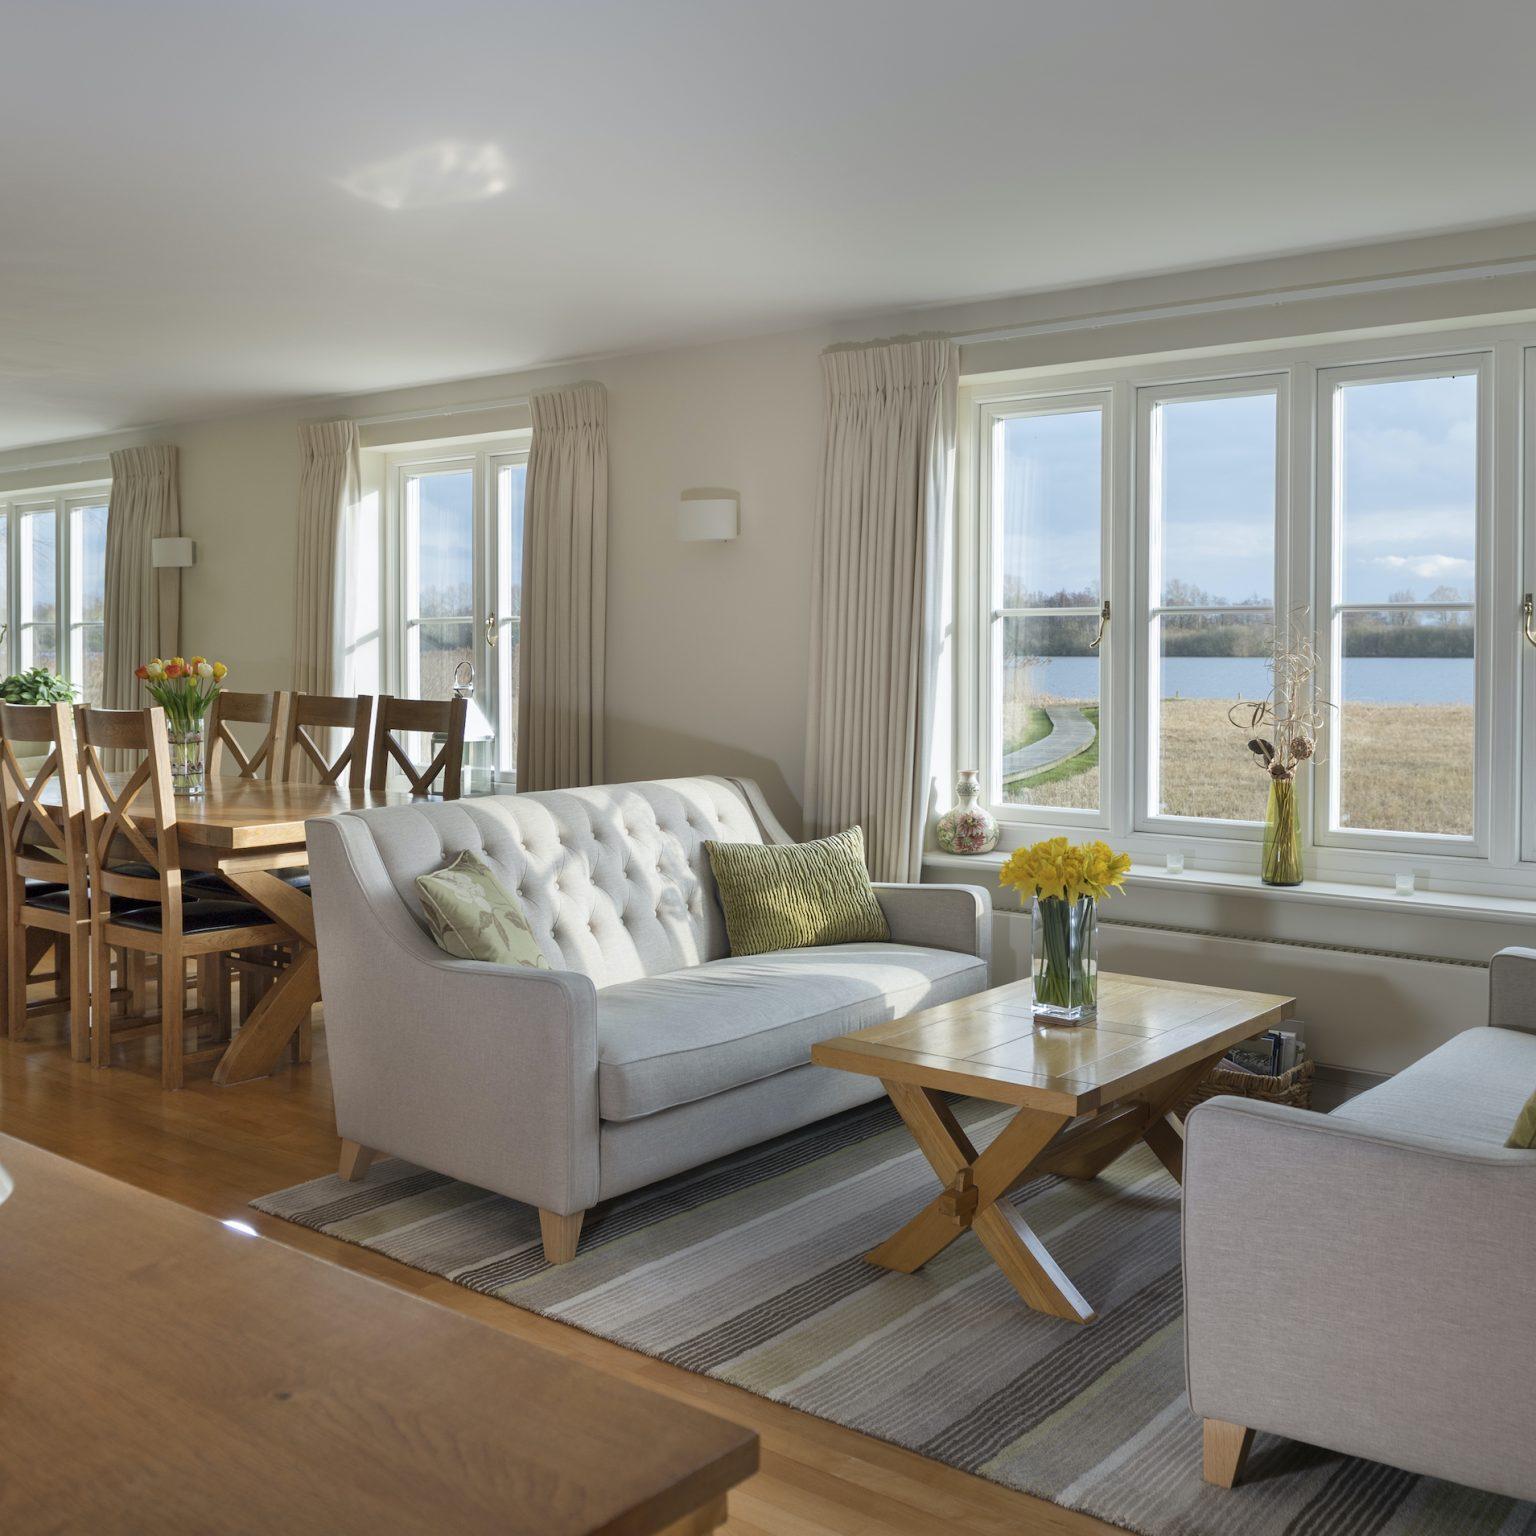 Residence 9 timber-look windows